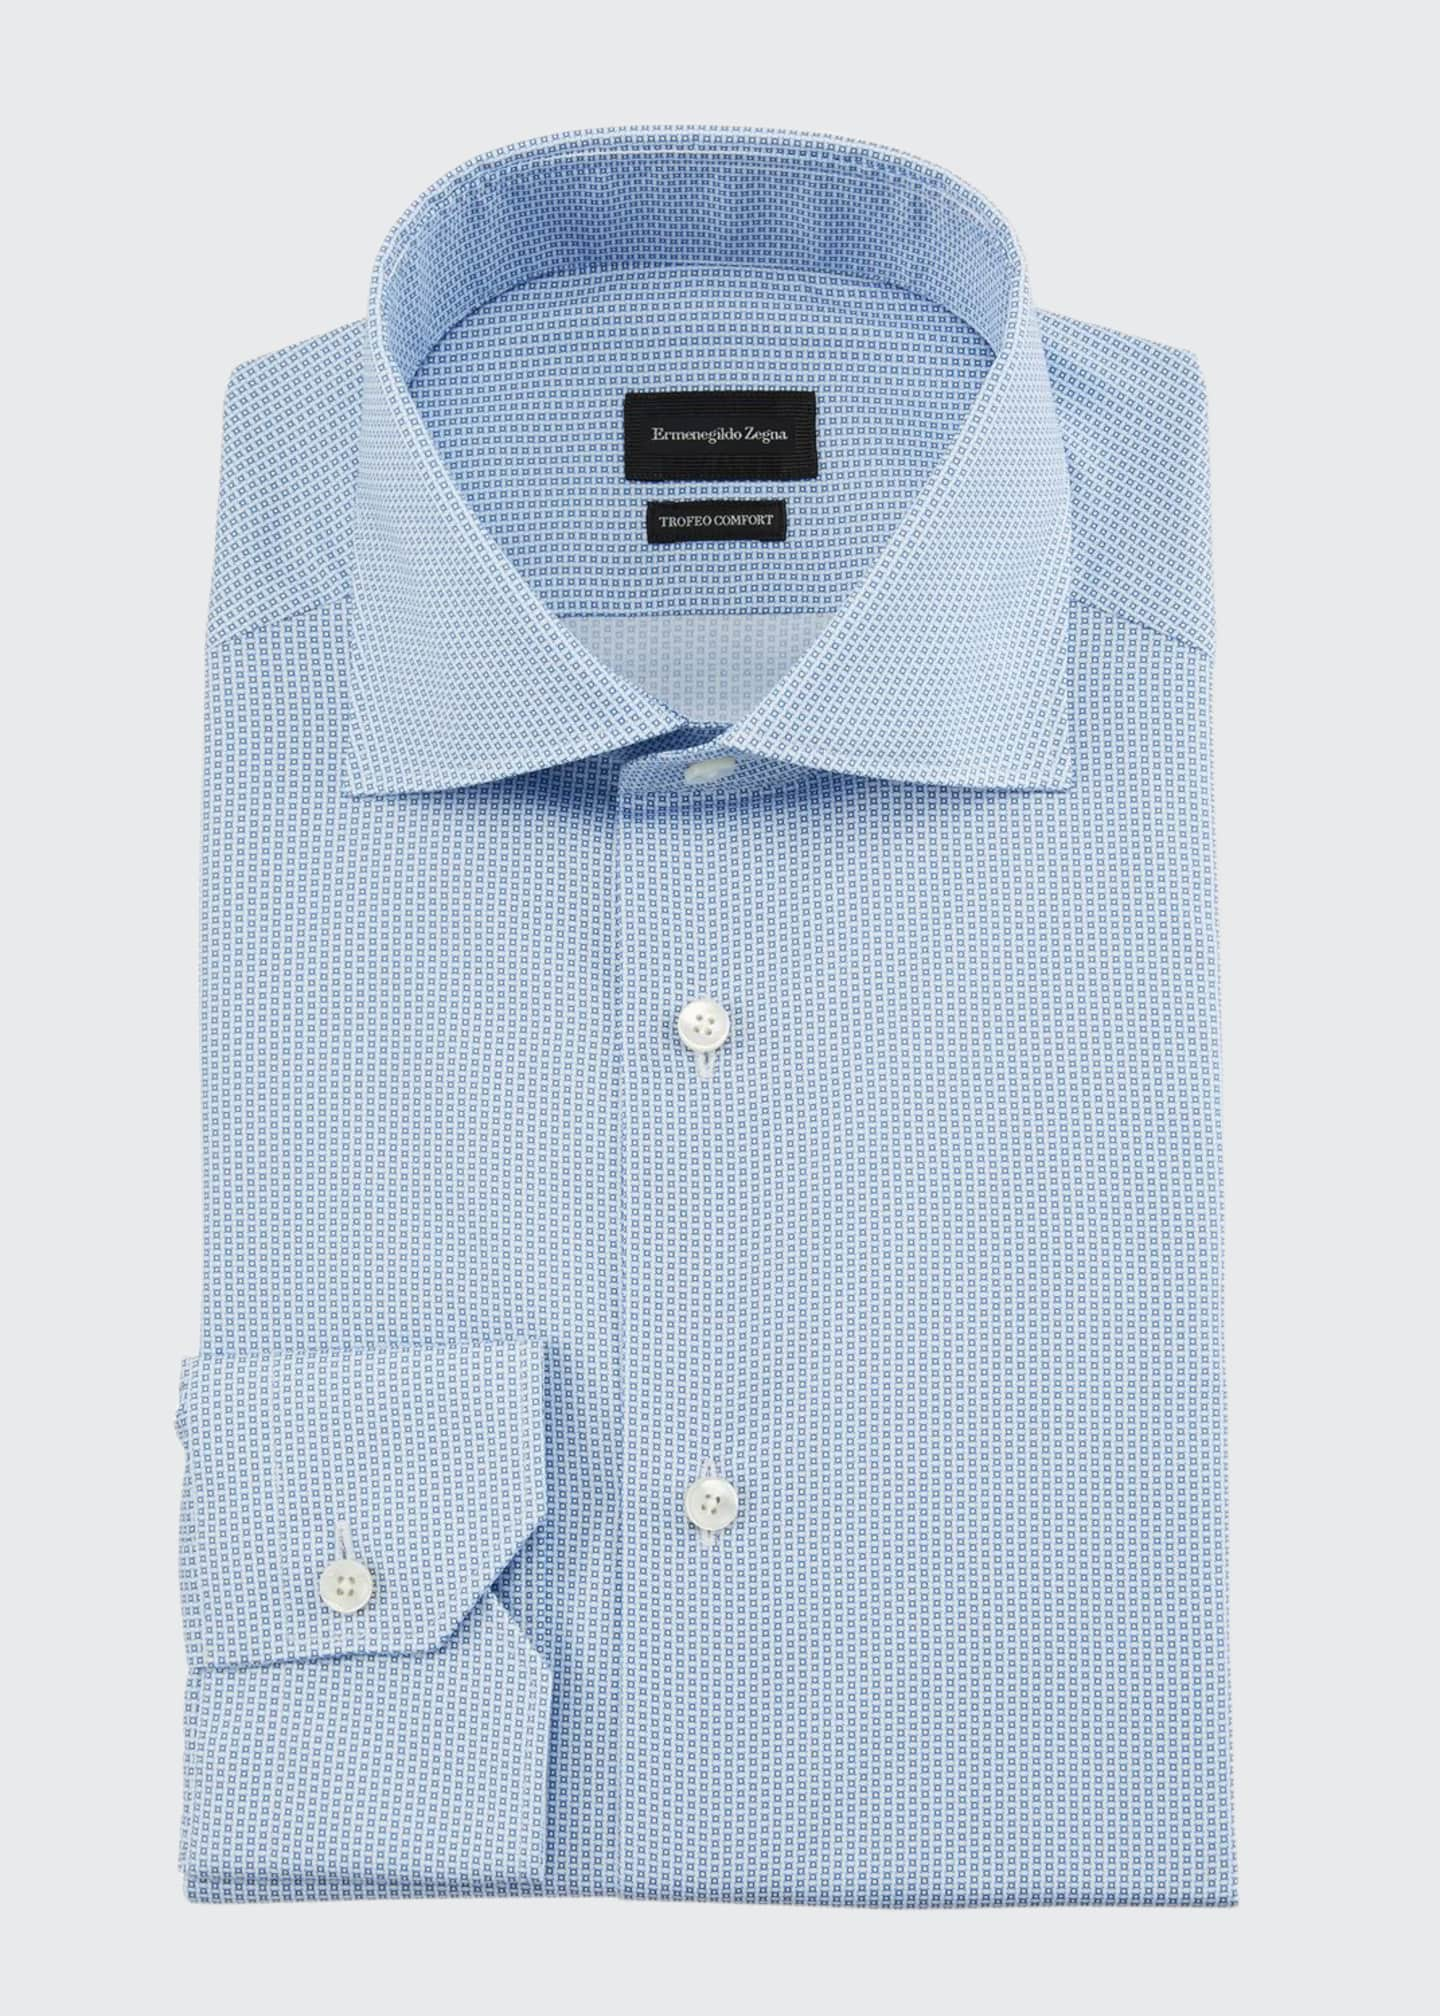 Ermenegildo Zegna Men's Trofeo Comfort Micro-Print Dress Shirt